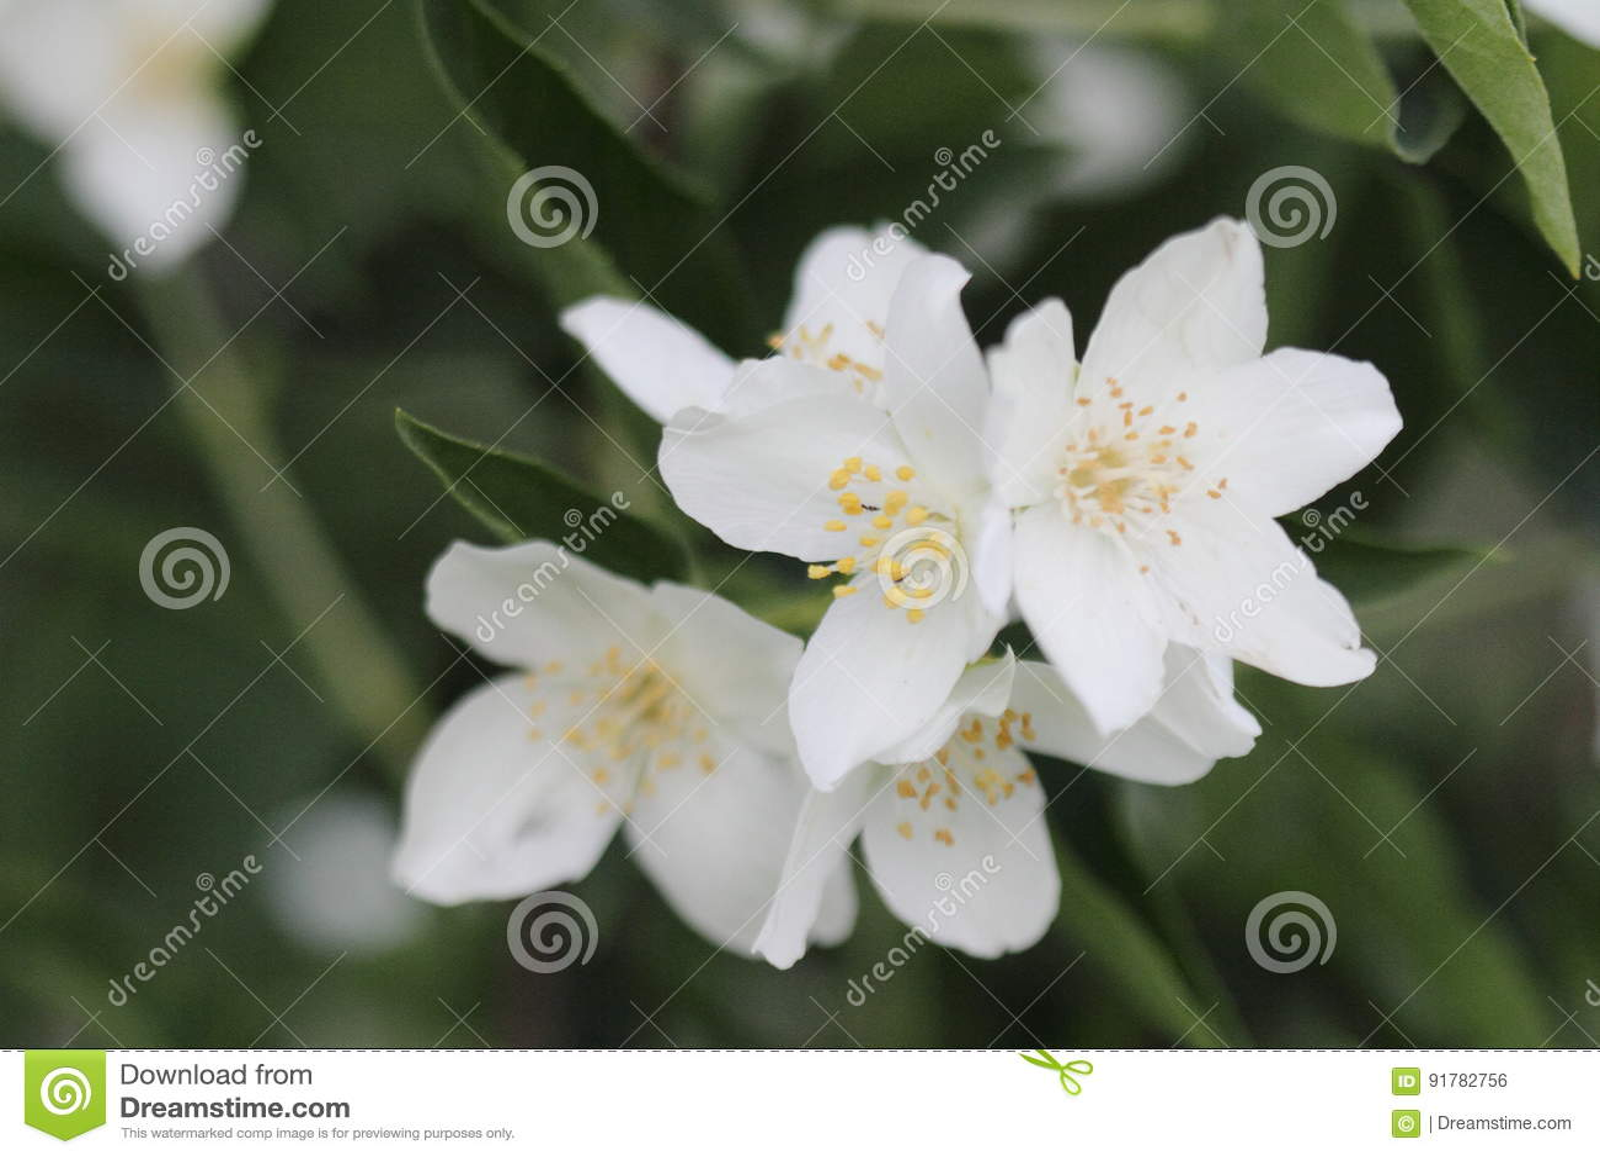 Beautiful white jasmine flower in the garden stock photo image of download beautiful white jasmine flower in the garden stock photo image of little garden izmirmasajfo